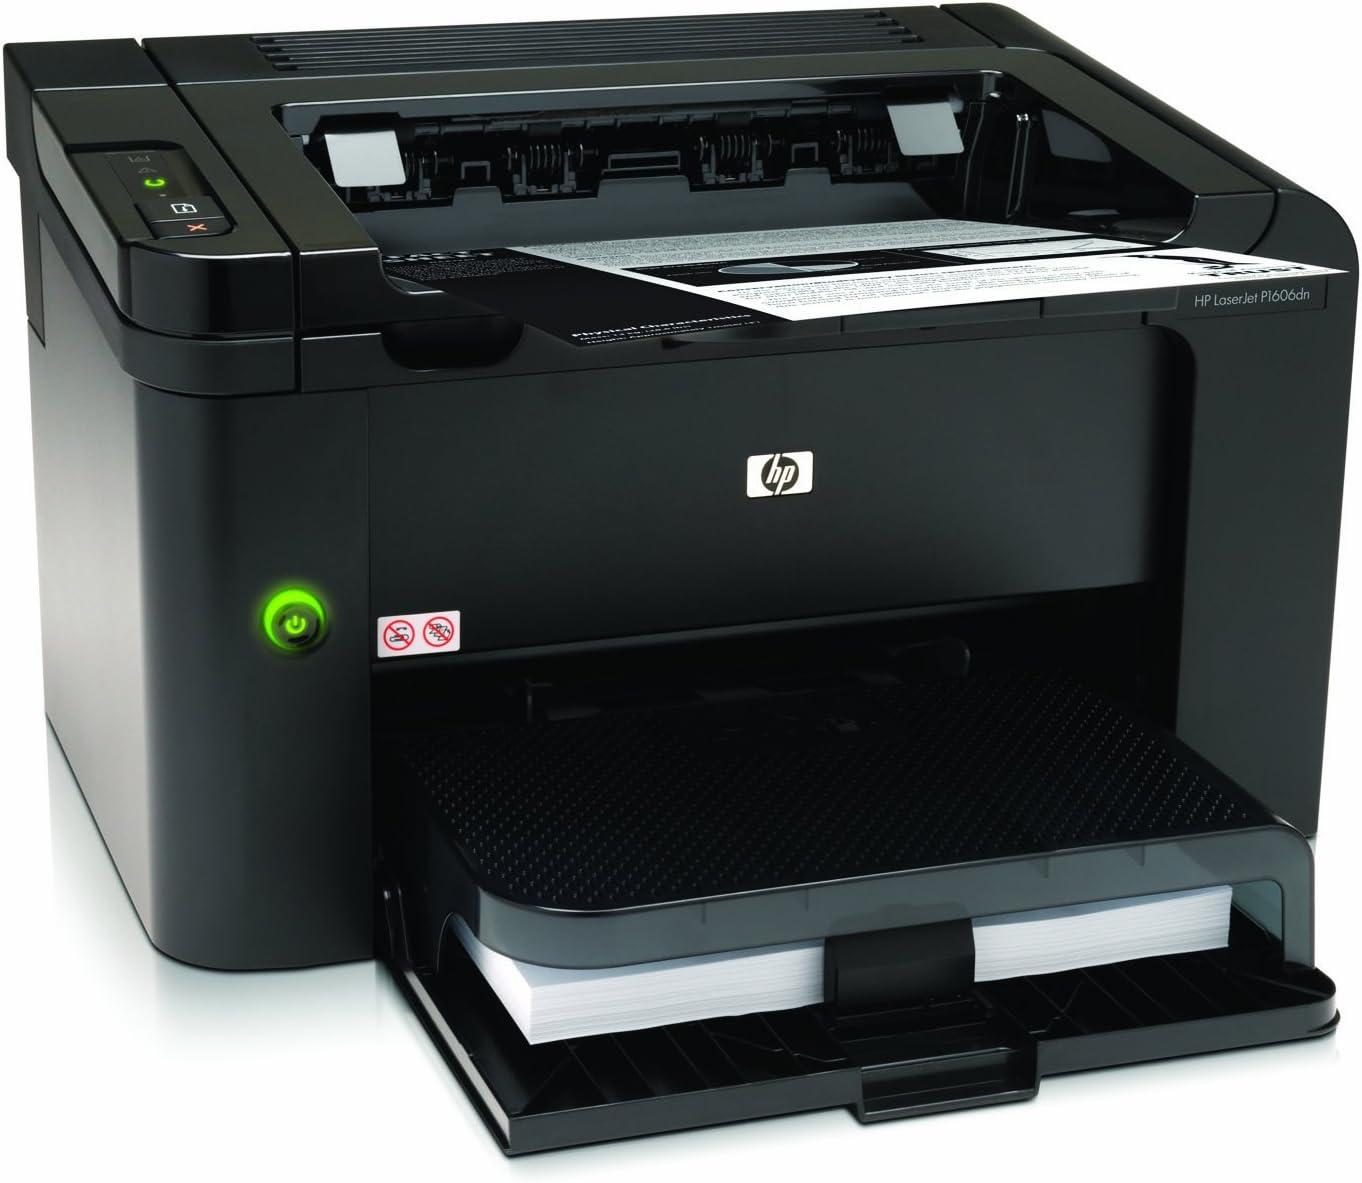 Amazon.com: HP LaserJet Pro P1606dn CE749A Impresora ...